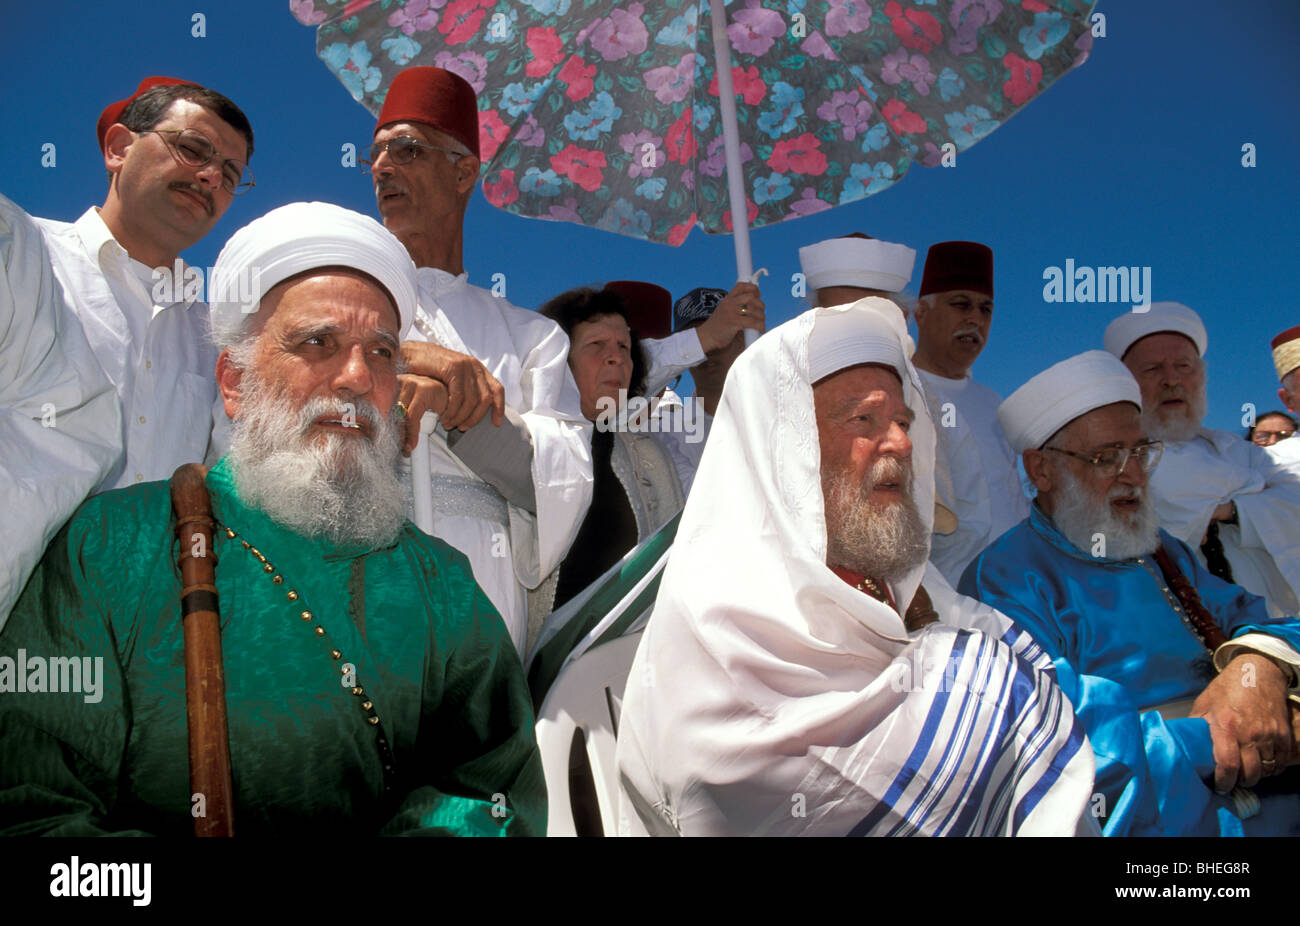 Samaria, the Samaritan Passover Sacrifice on Mount Gerizim, Samaritan Priests - Stock Image